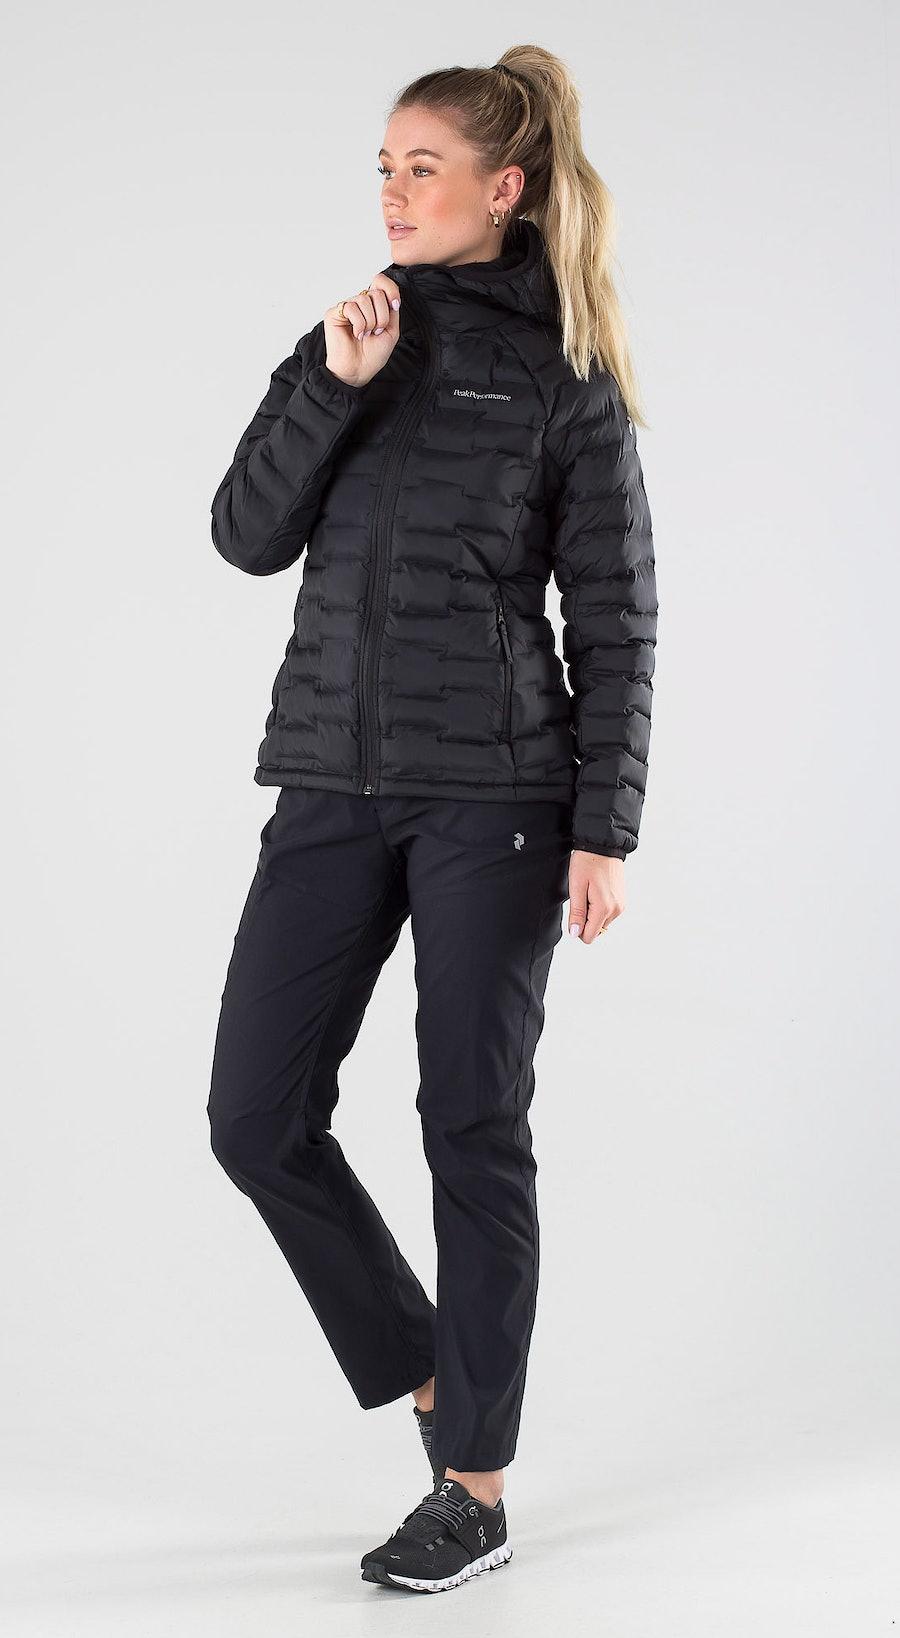 Peak Performance Argon Light Black Outfit Multi